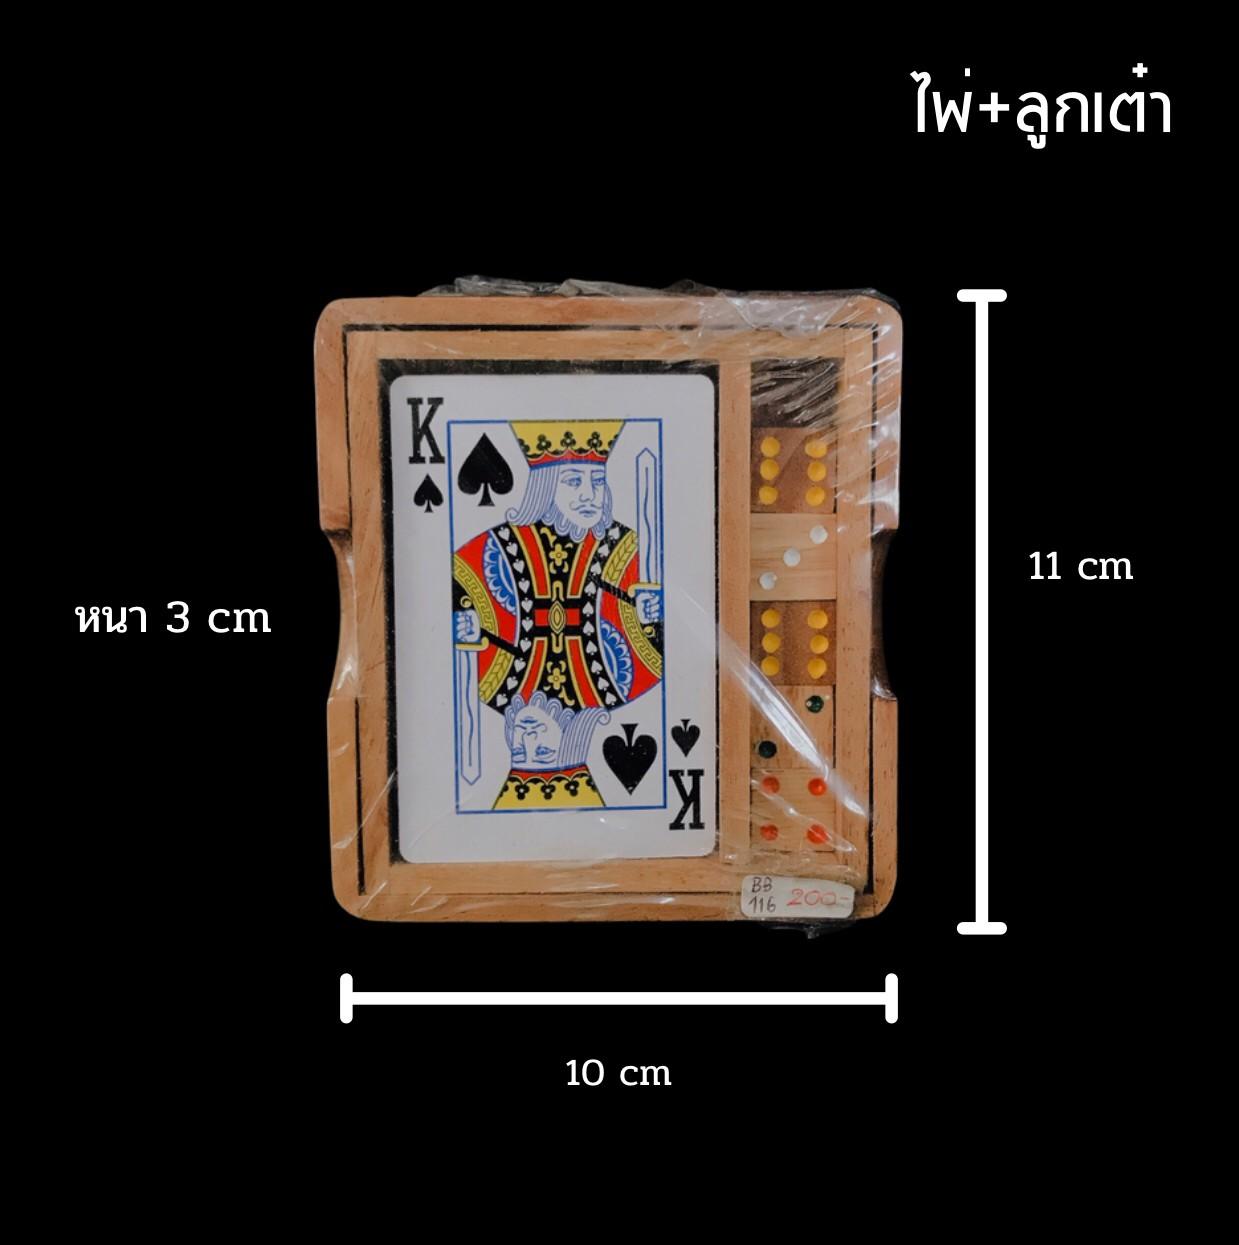 Play Card + Box ไพ่+ลูกเต๋า